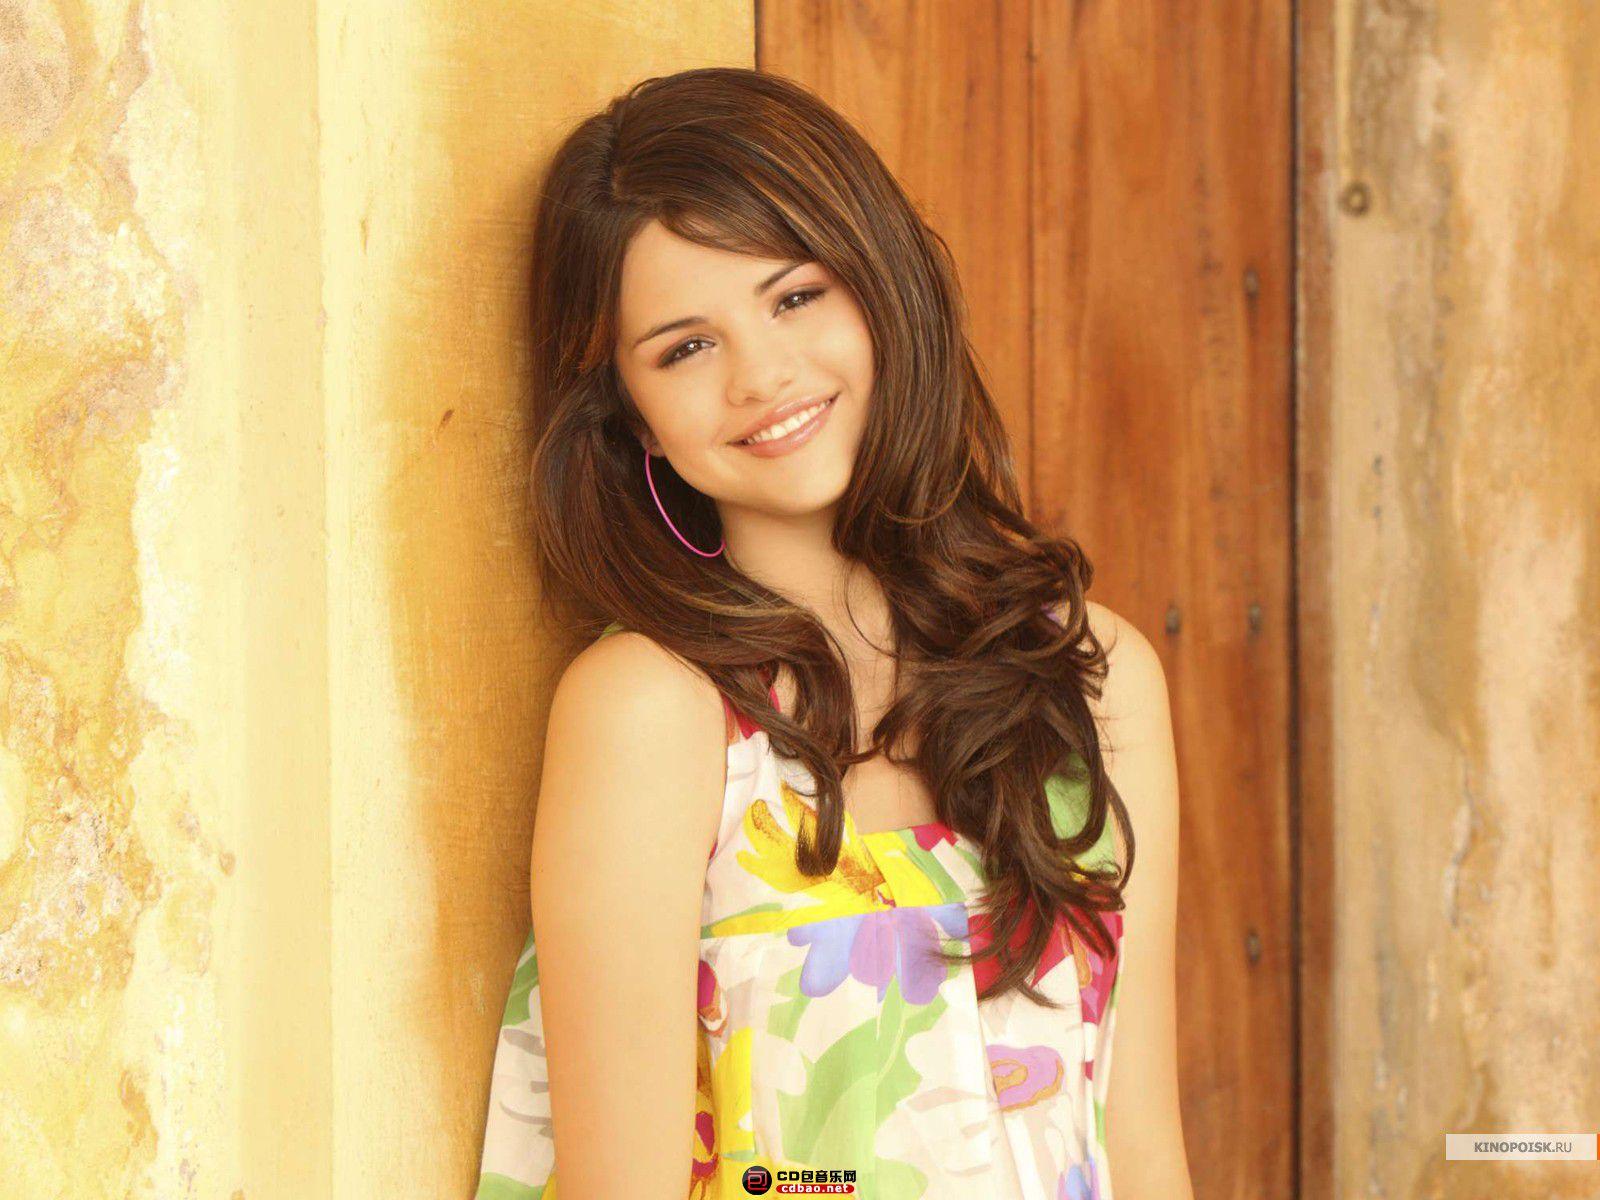 kinopoisk.ru-Selena-Gomez-989521_1600.jpg